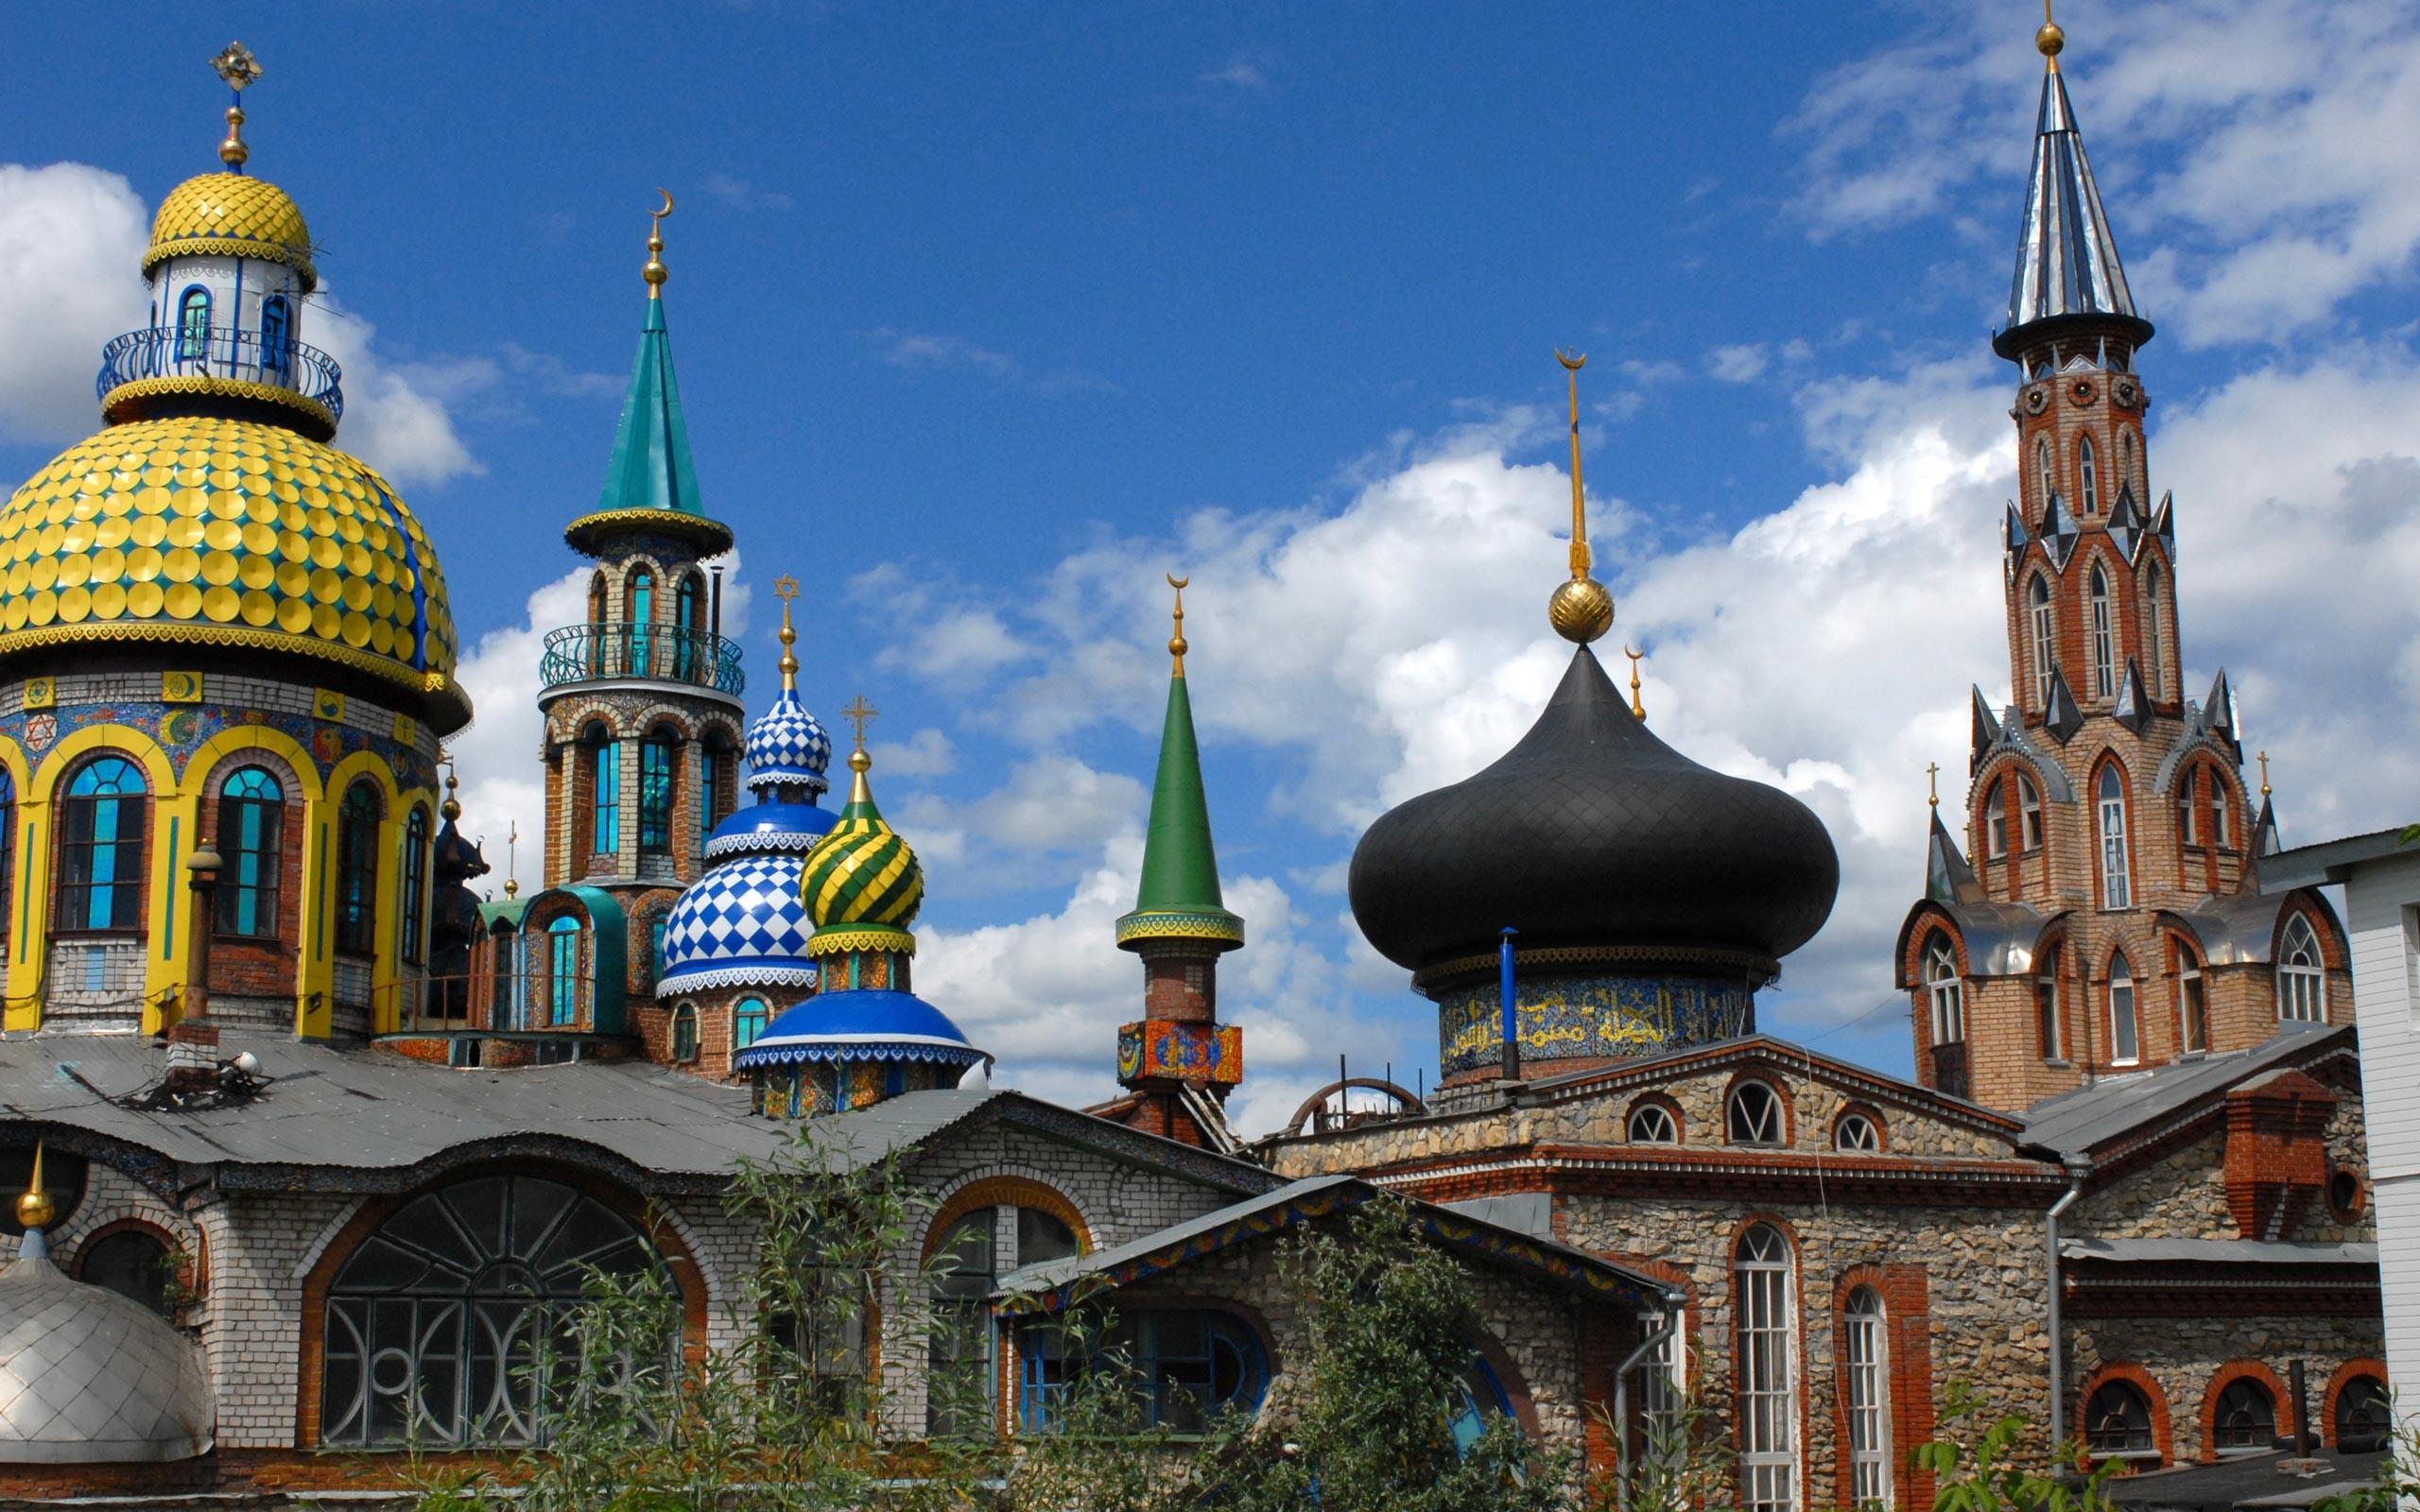 "<p>Фото: &copy;&nbsp;<a href=""https://commons.wikimedia.org/wiki/File:All_Religions_Kazan_Temple_115.jpeg"" target=""_blank"">wikimedia.org</a></p>"